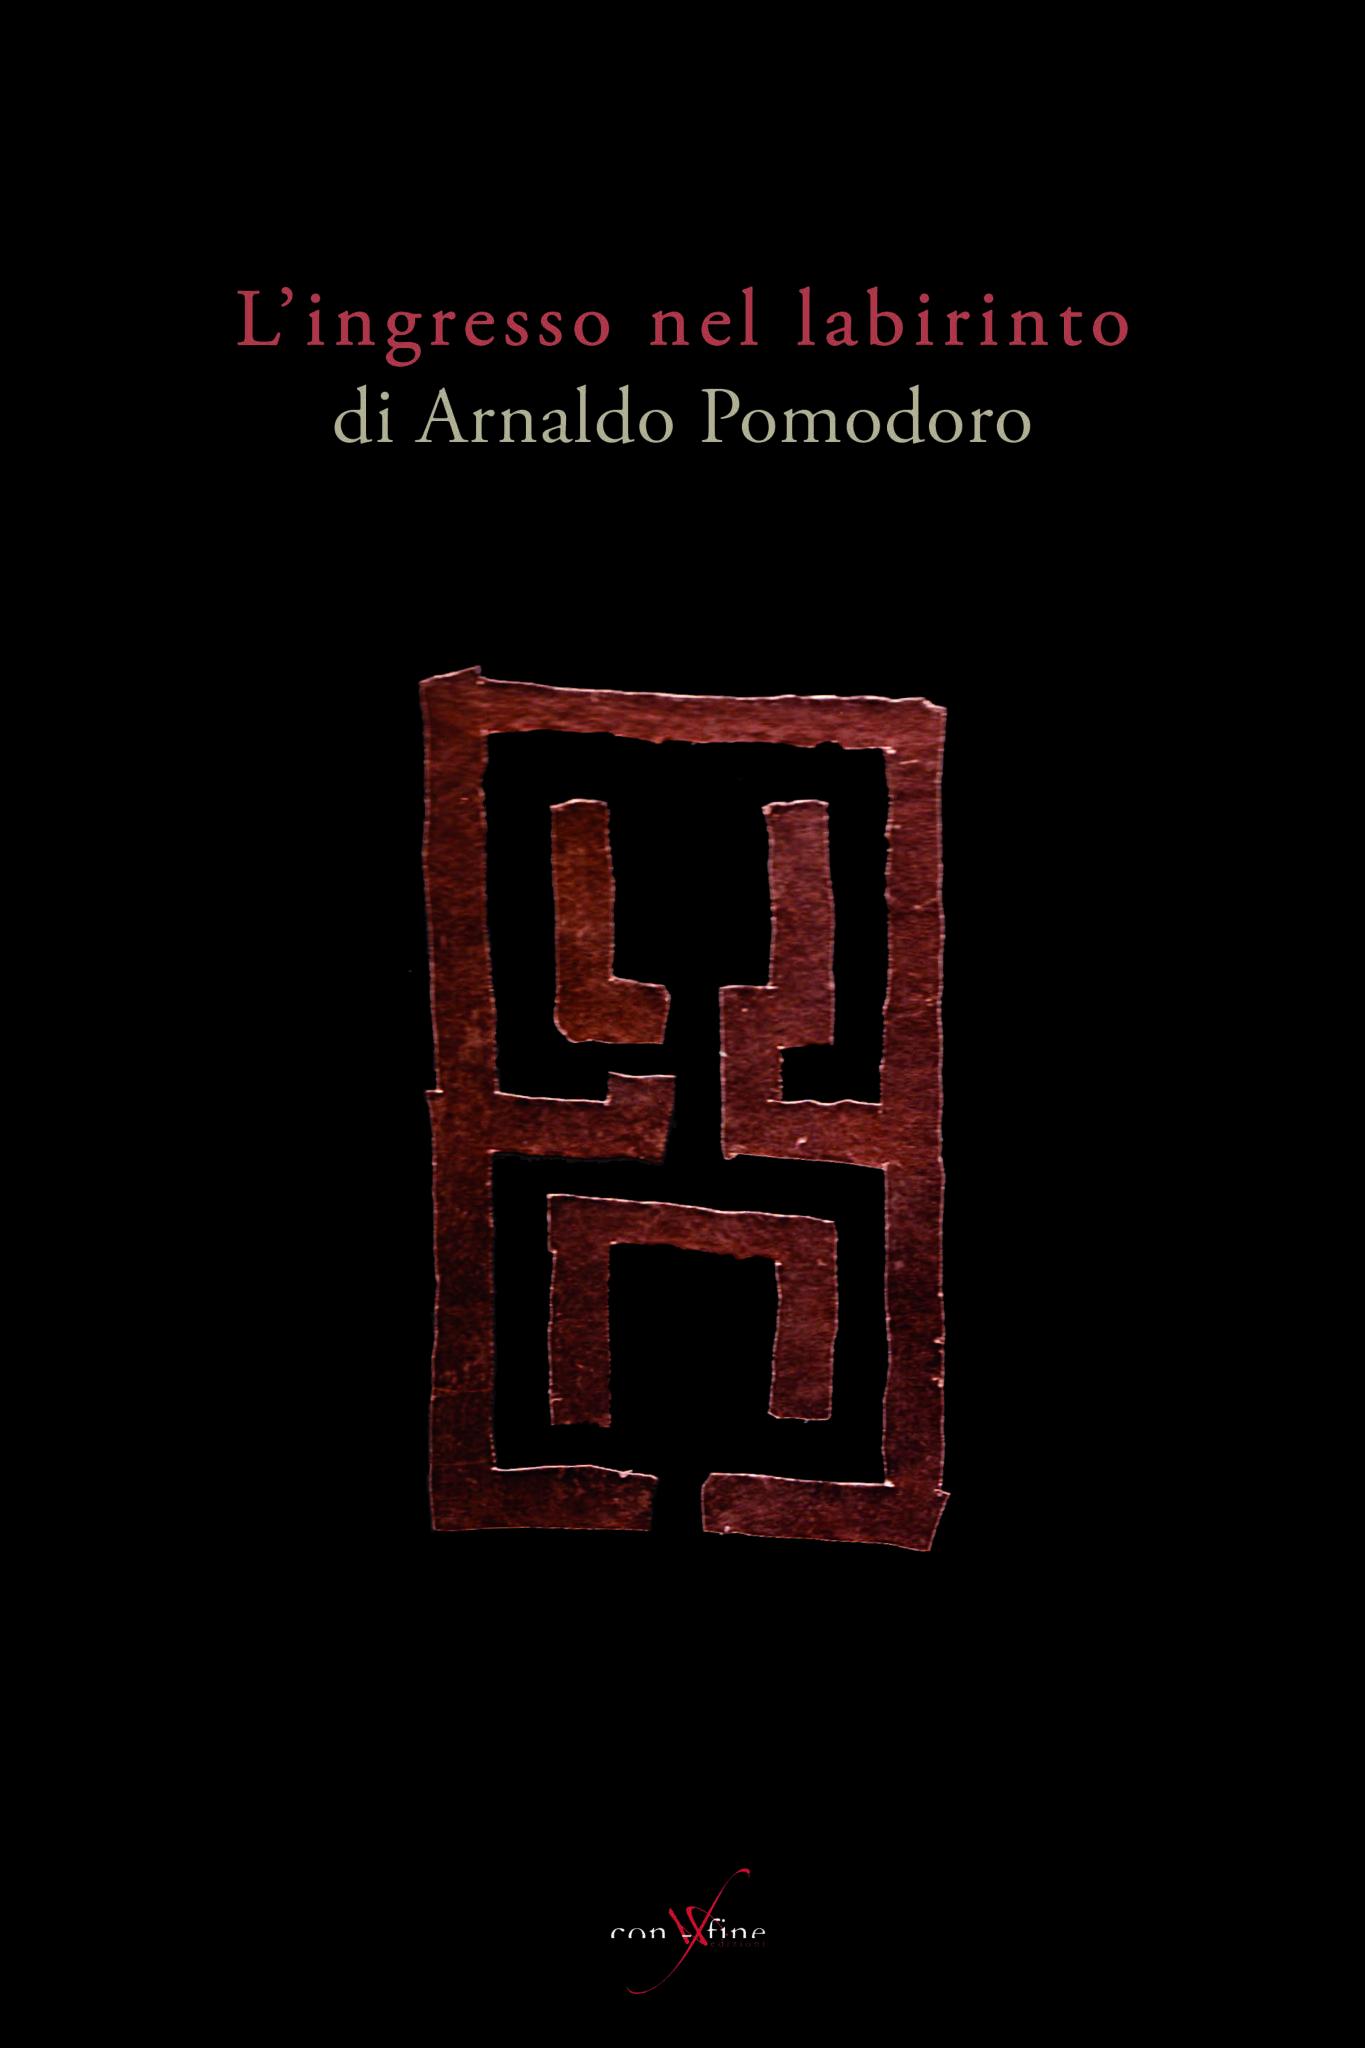 Arnaldo Pomodoro Gino Fienga ingresso nel labirinto